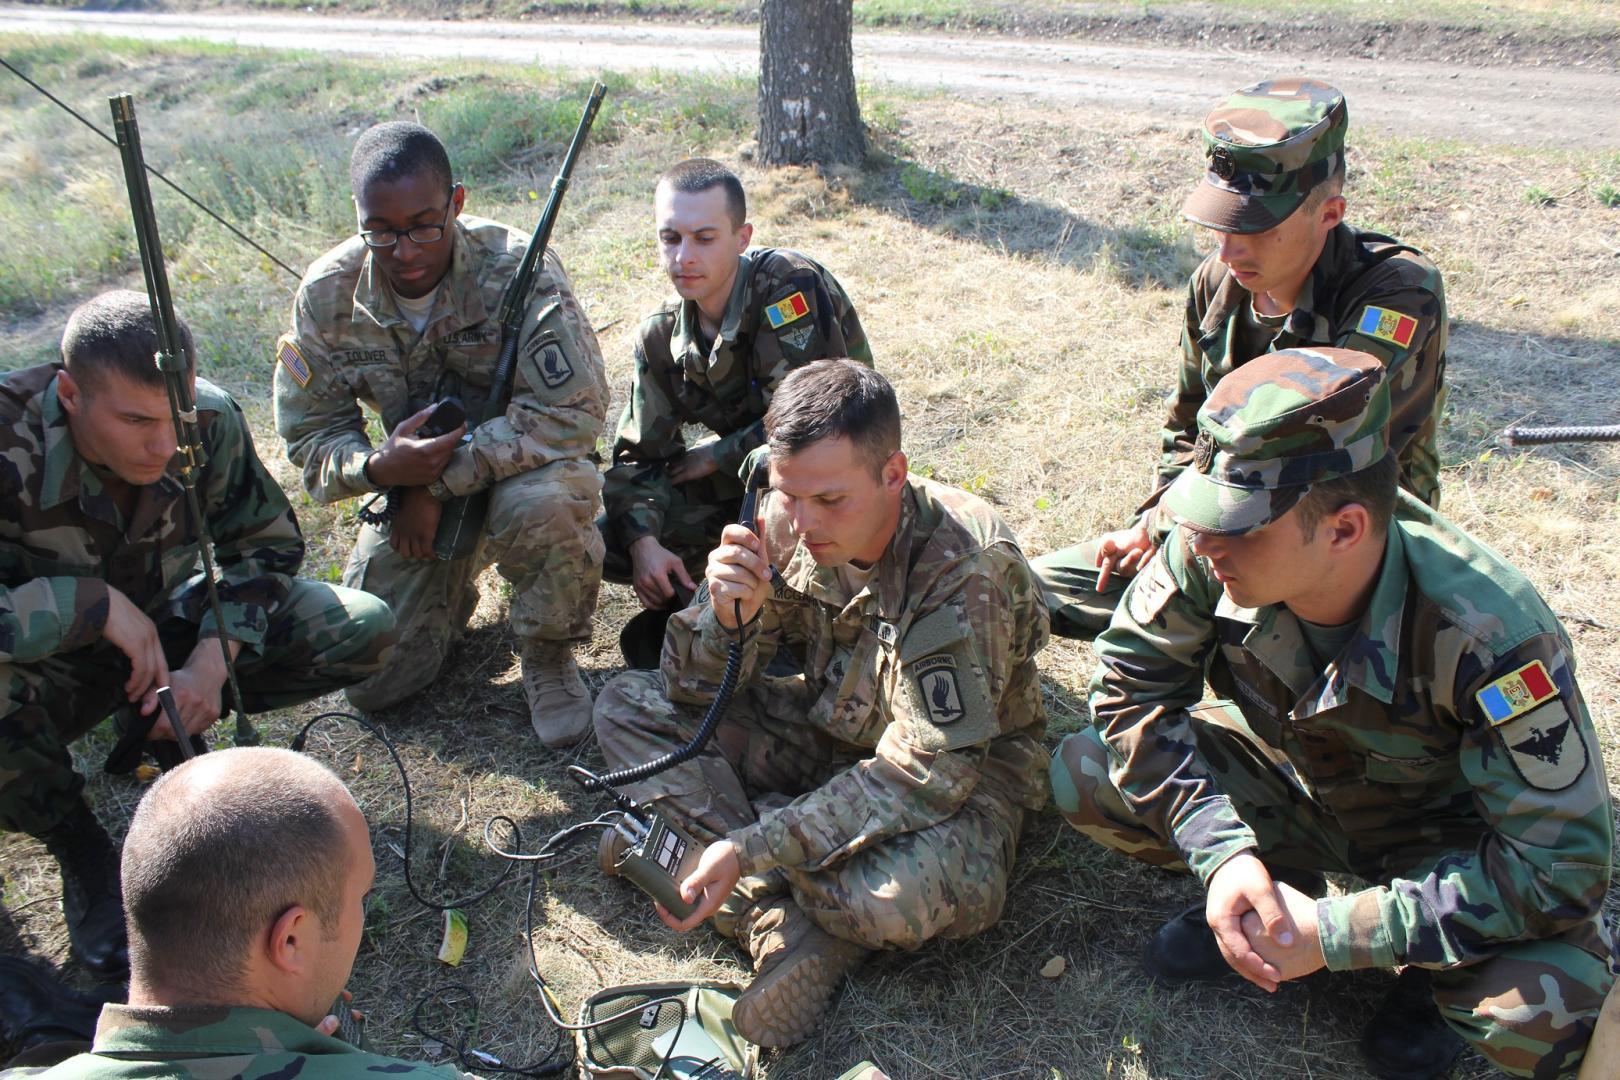 Armata Republicii Moldova beneficiază de sprijinul NATO